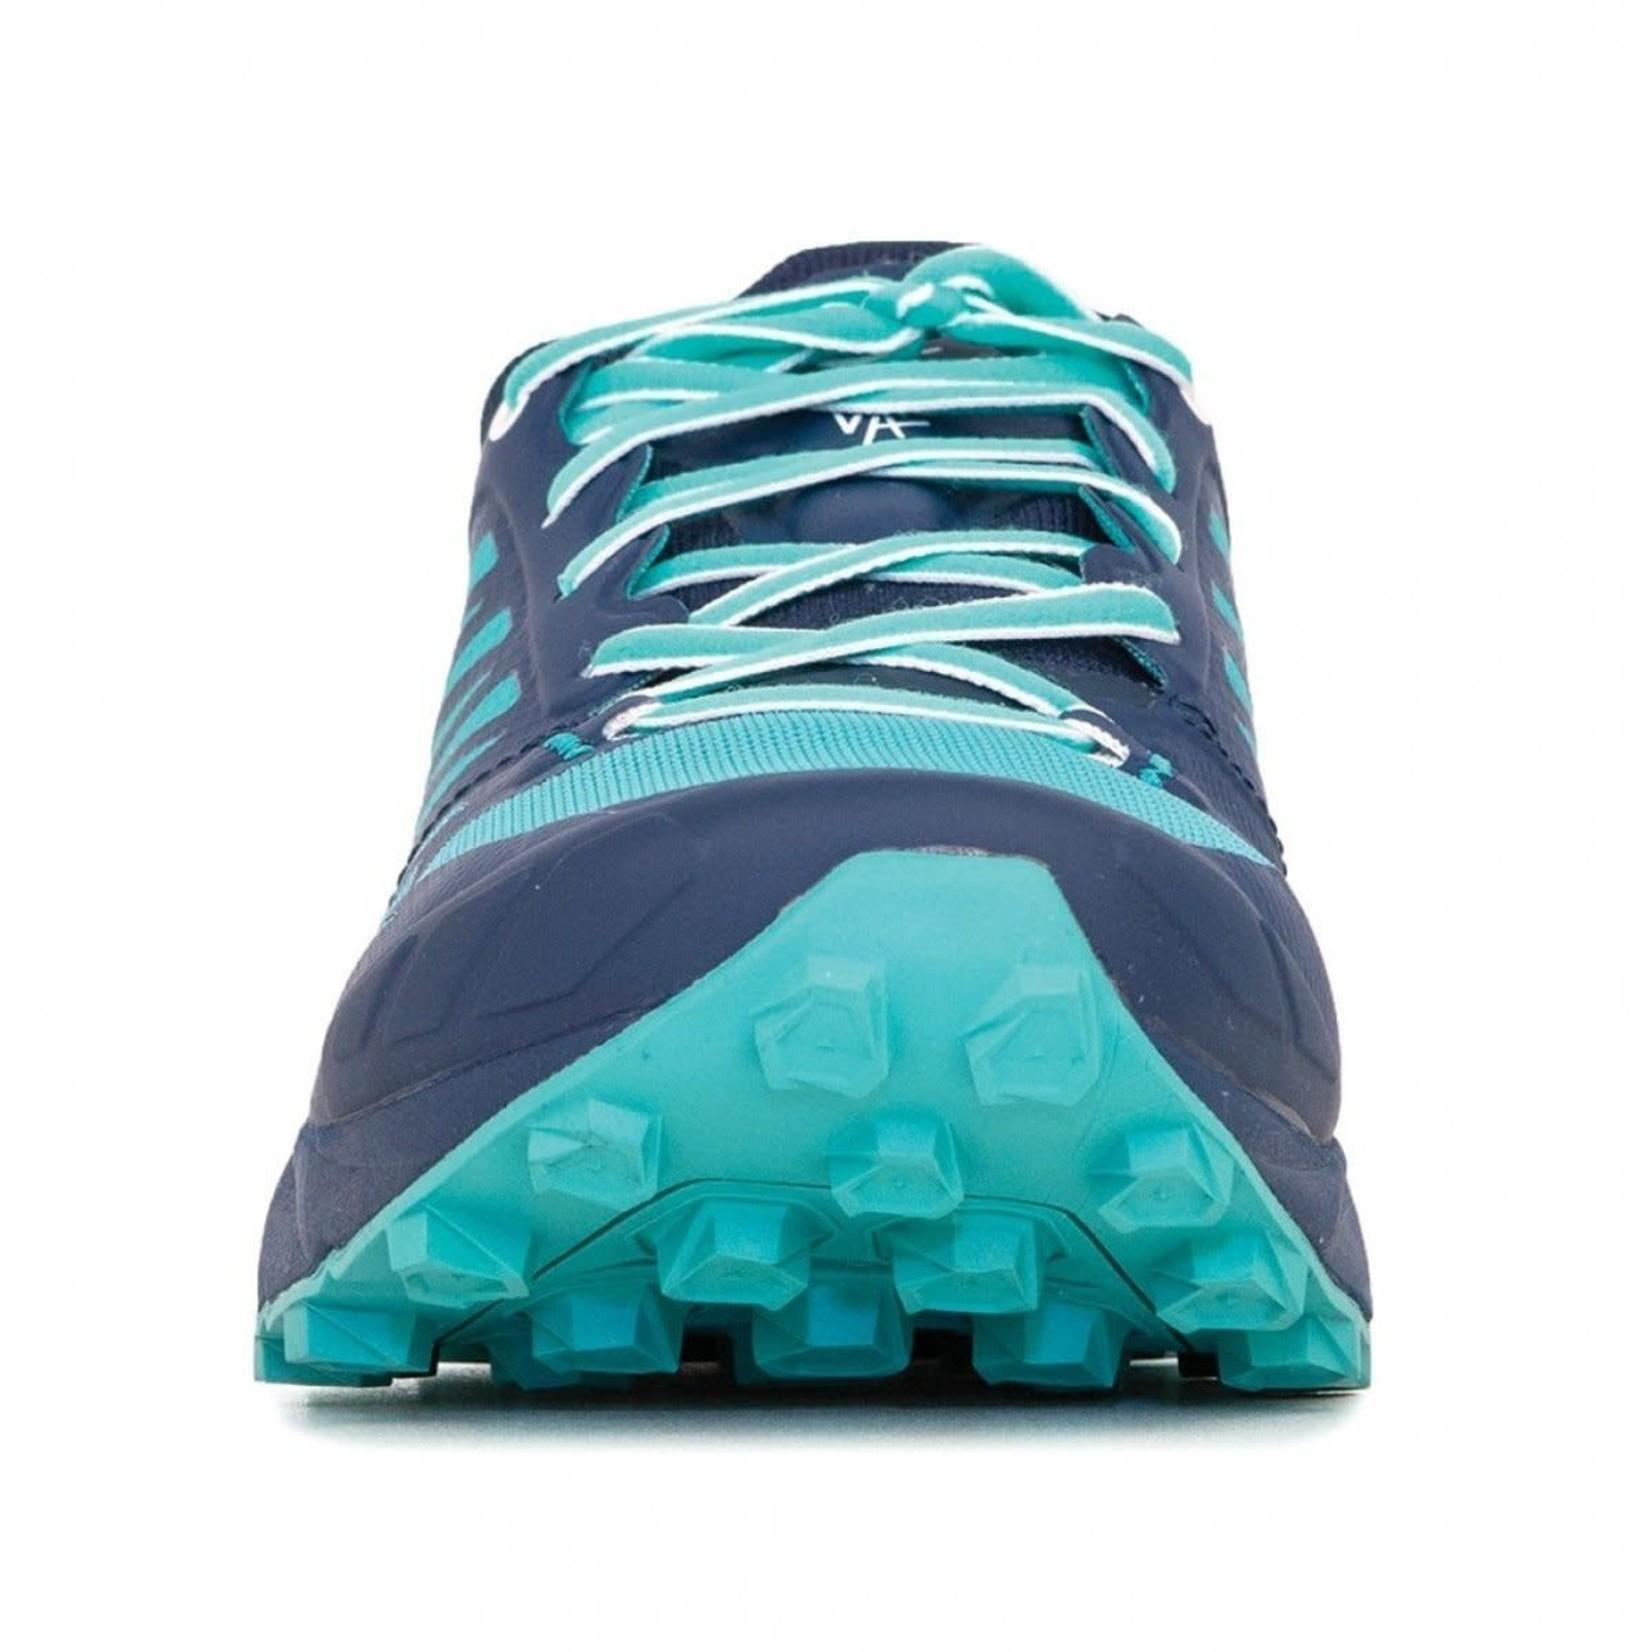 La Sportiva La Sportiva Kaptiva Trail Running Shoes - Women